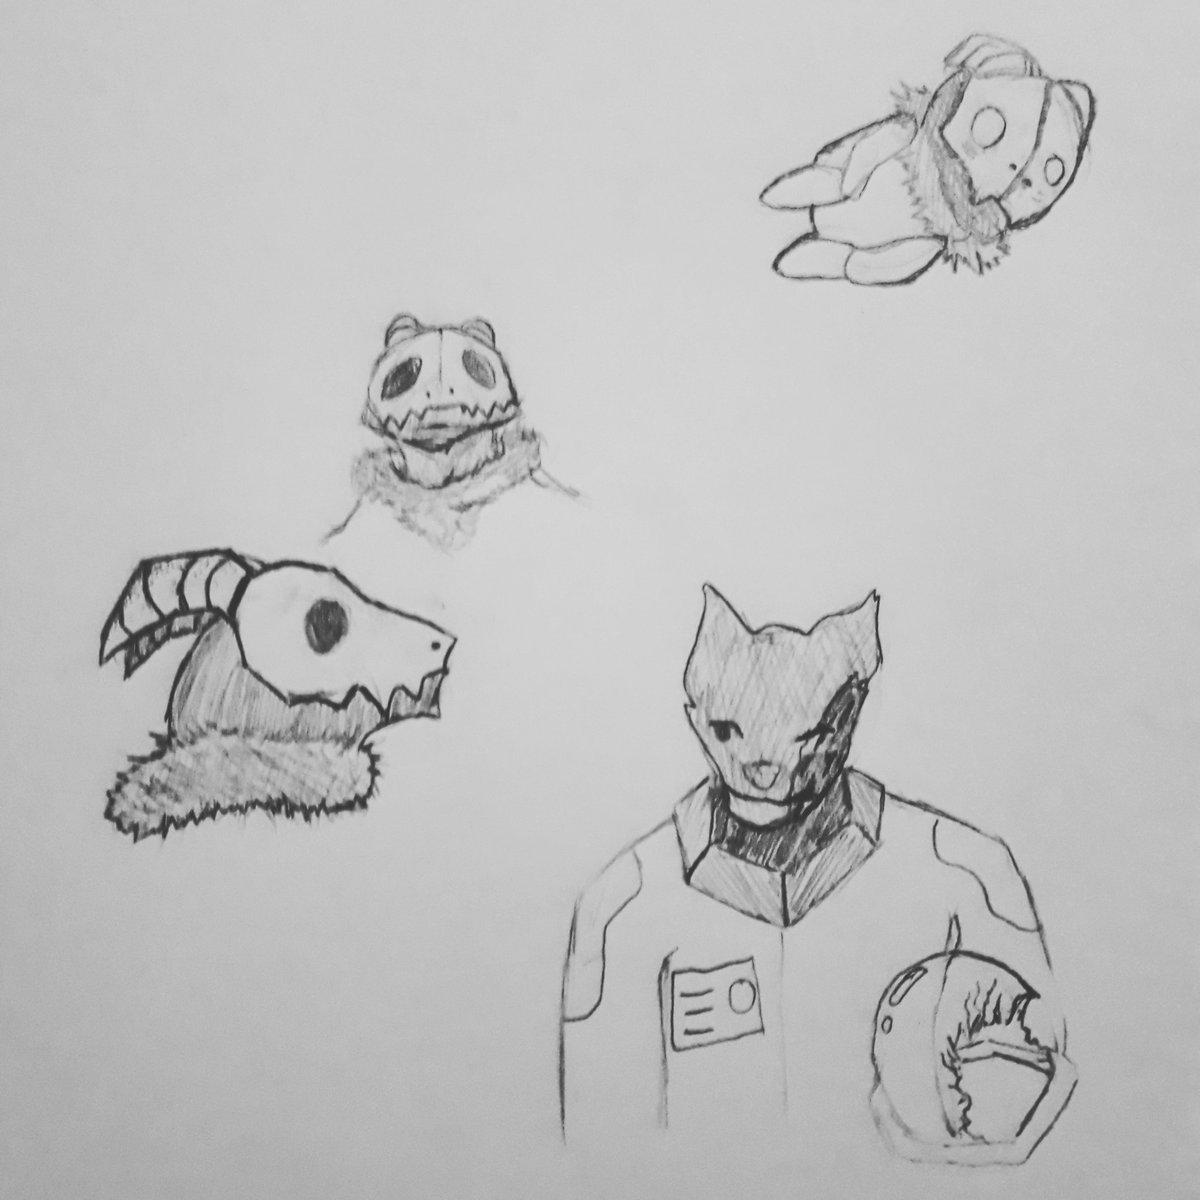 #NightlyDrawing 94 Random Doodles pic.twitter.com/flh9y8gCcG